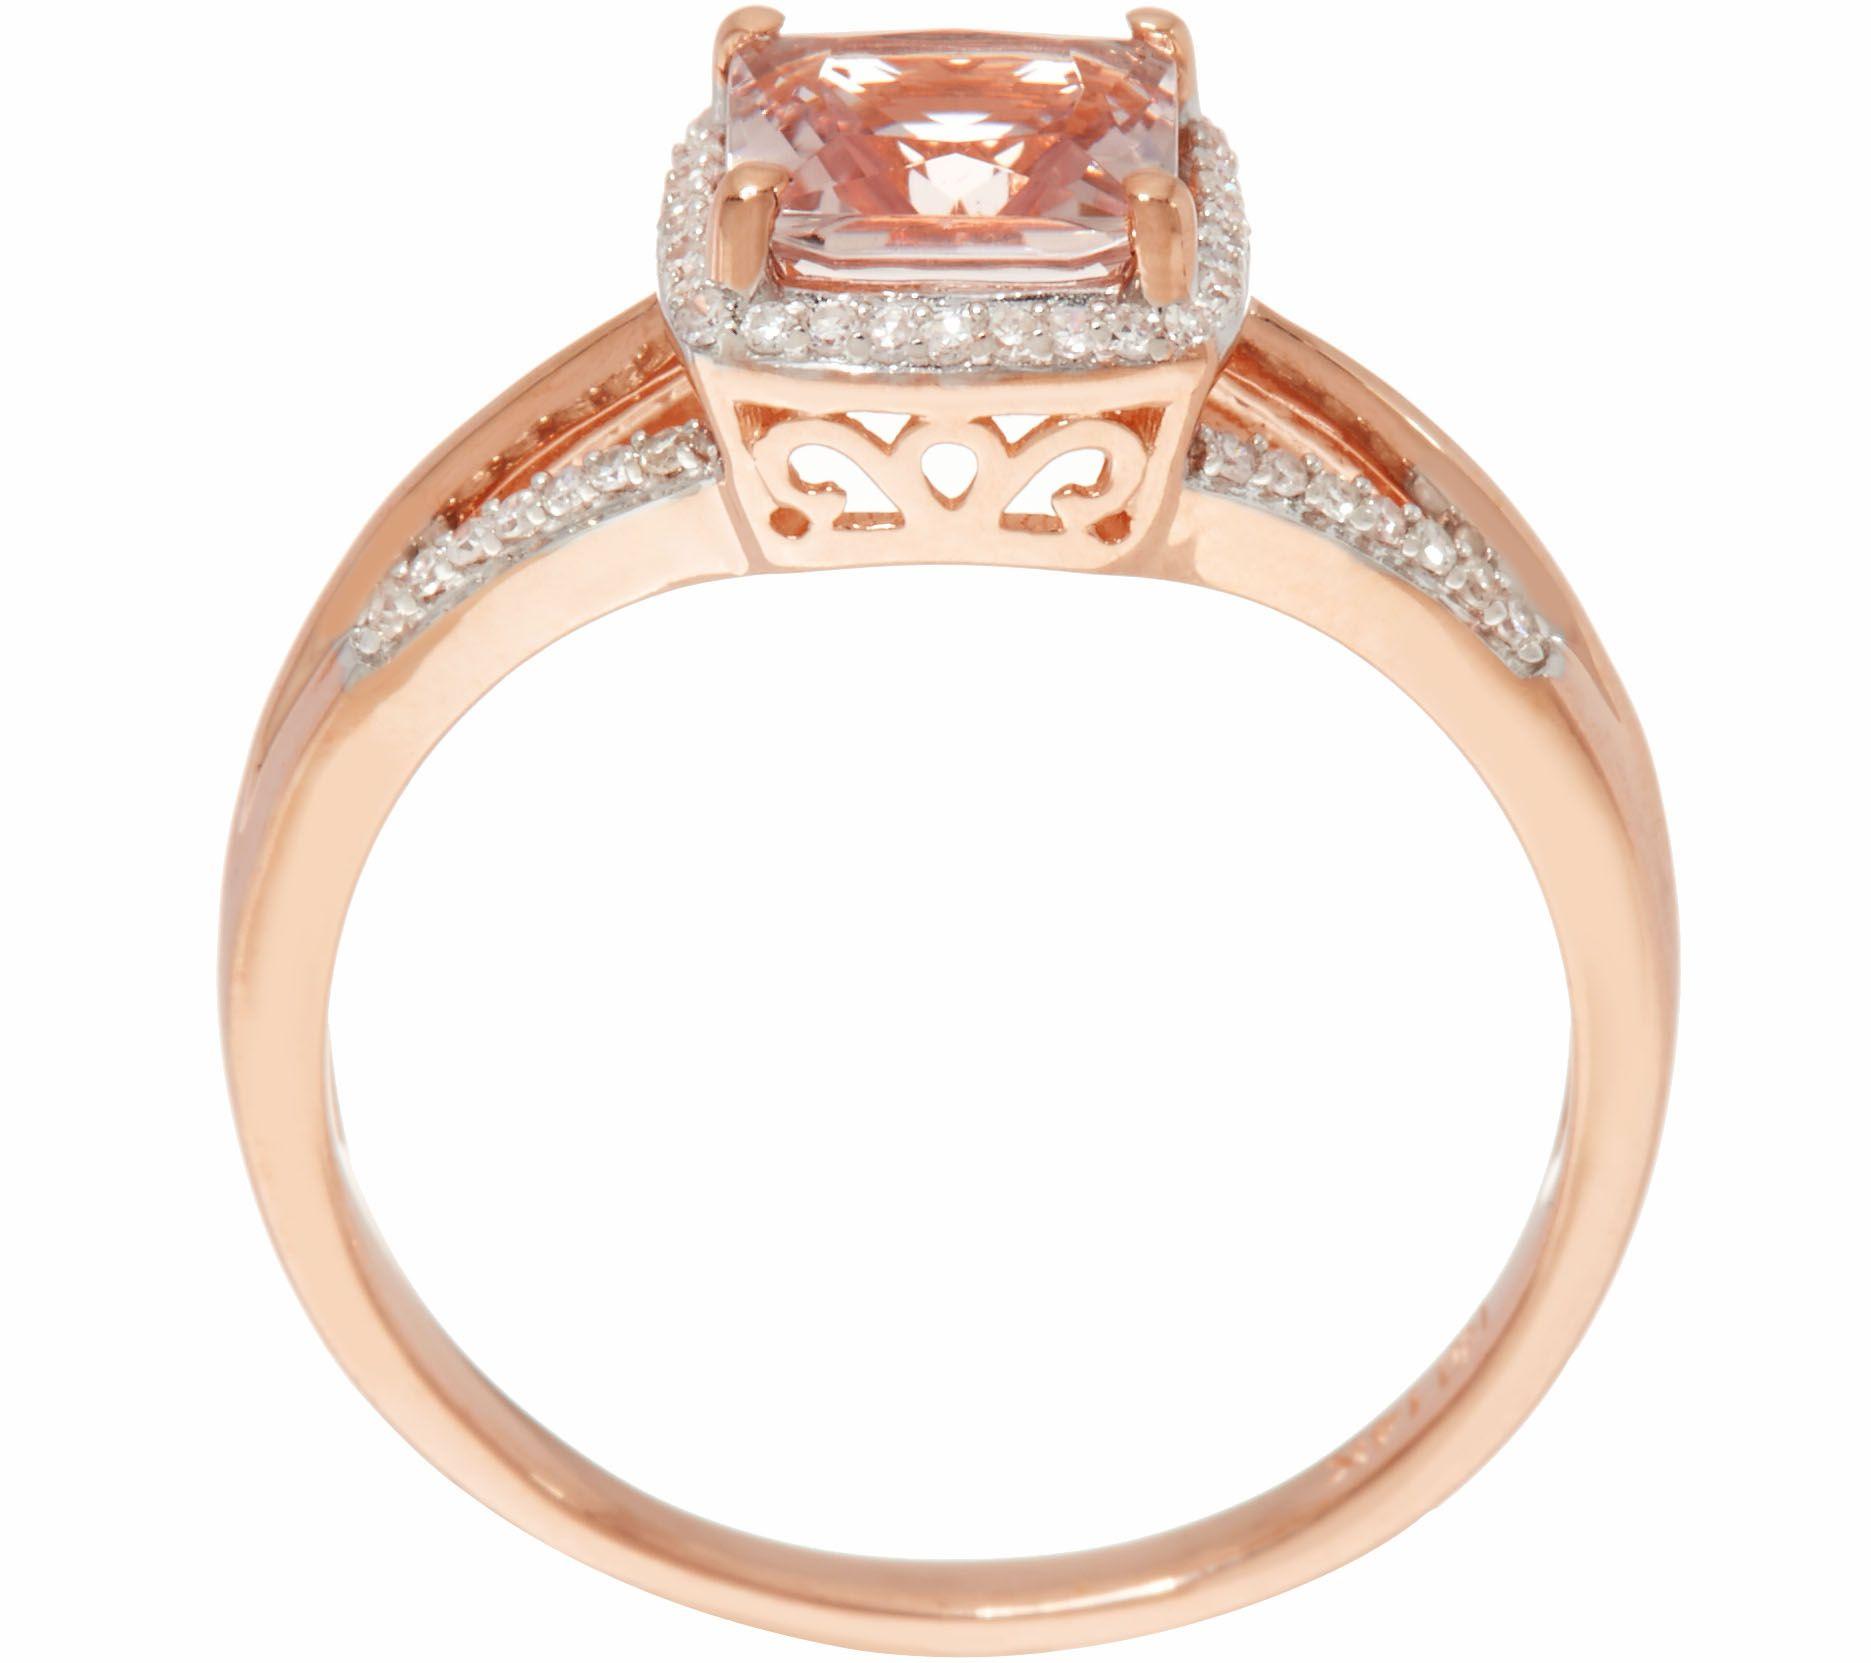 Princess Cut Morganite & Diamond Ring 14K Gold 0 80 ct Page 1